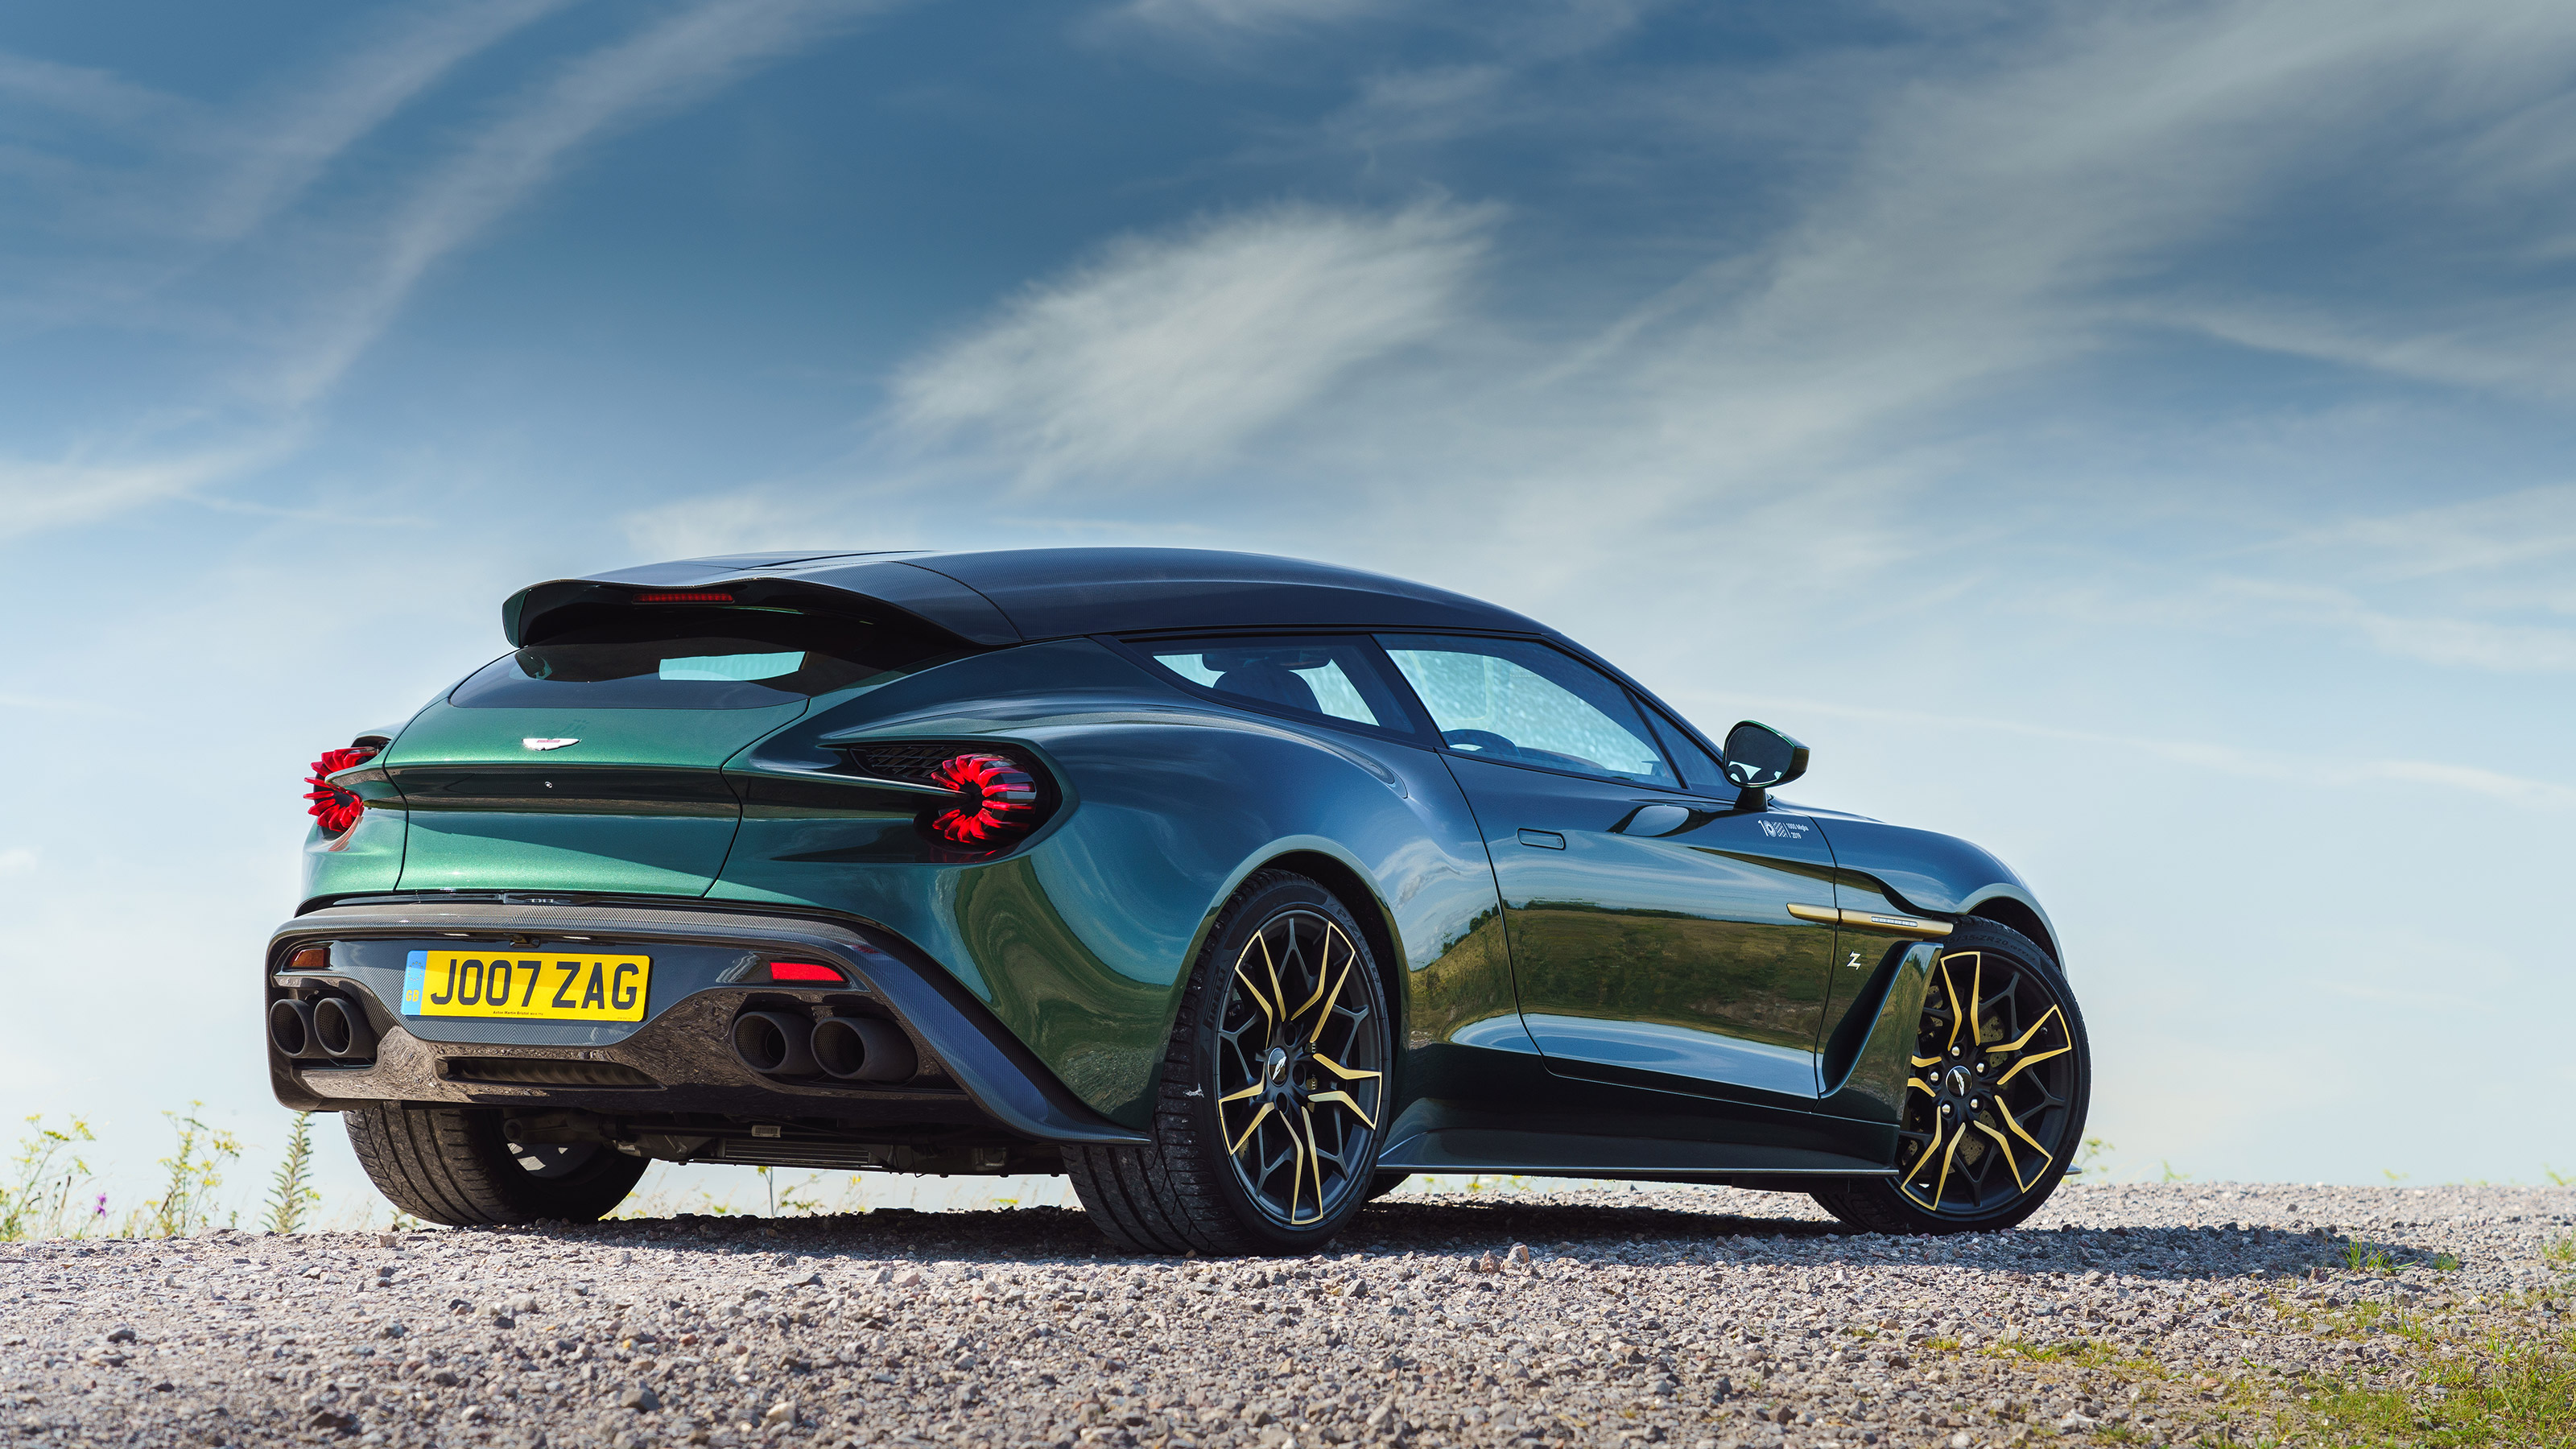 2019 Aston Martin Vanquish Zagato Shooting Brake Review Evo